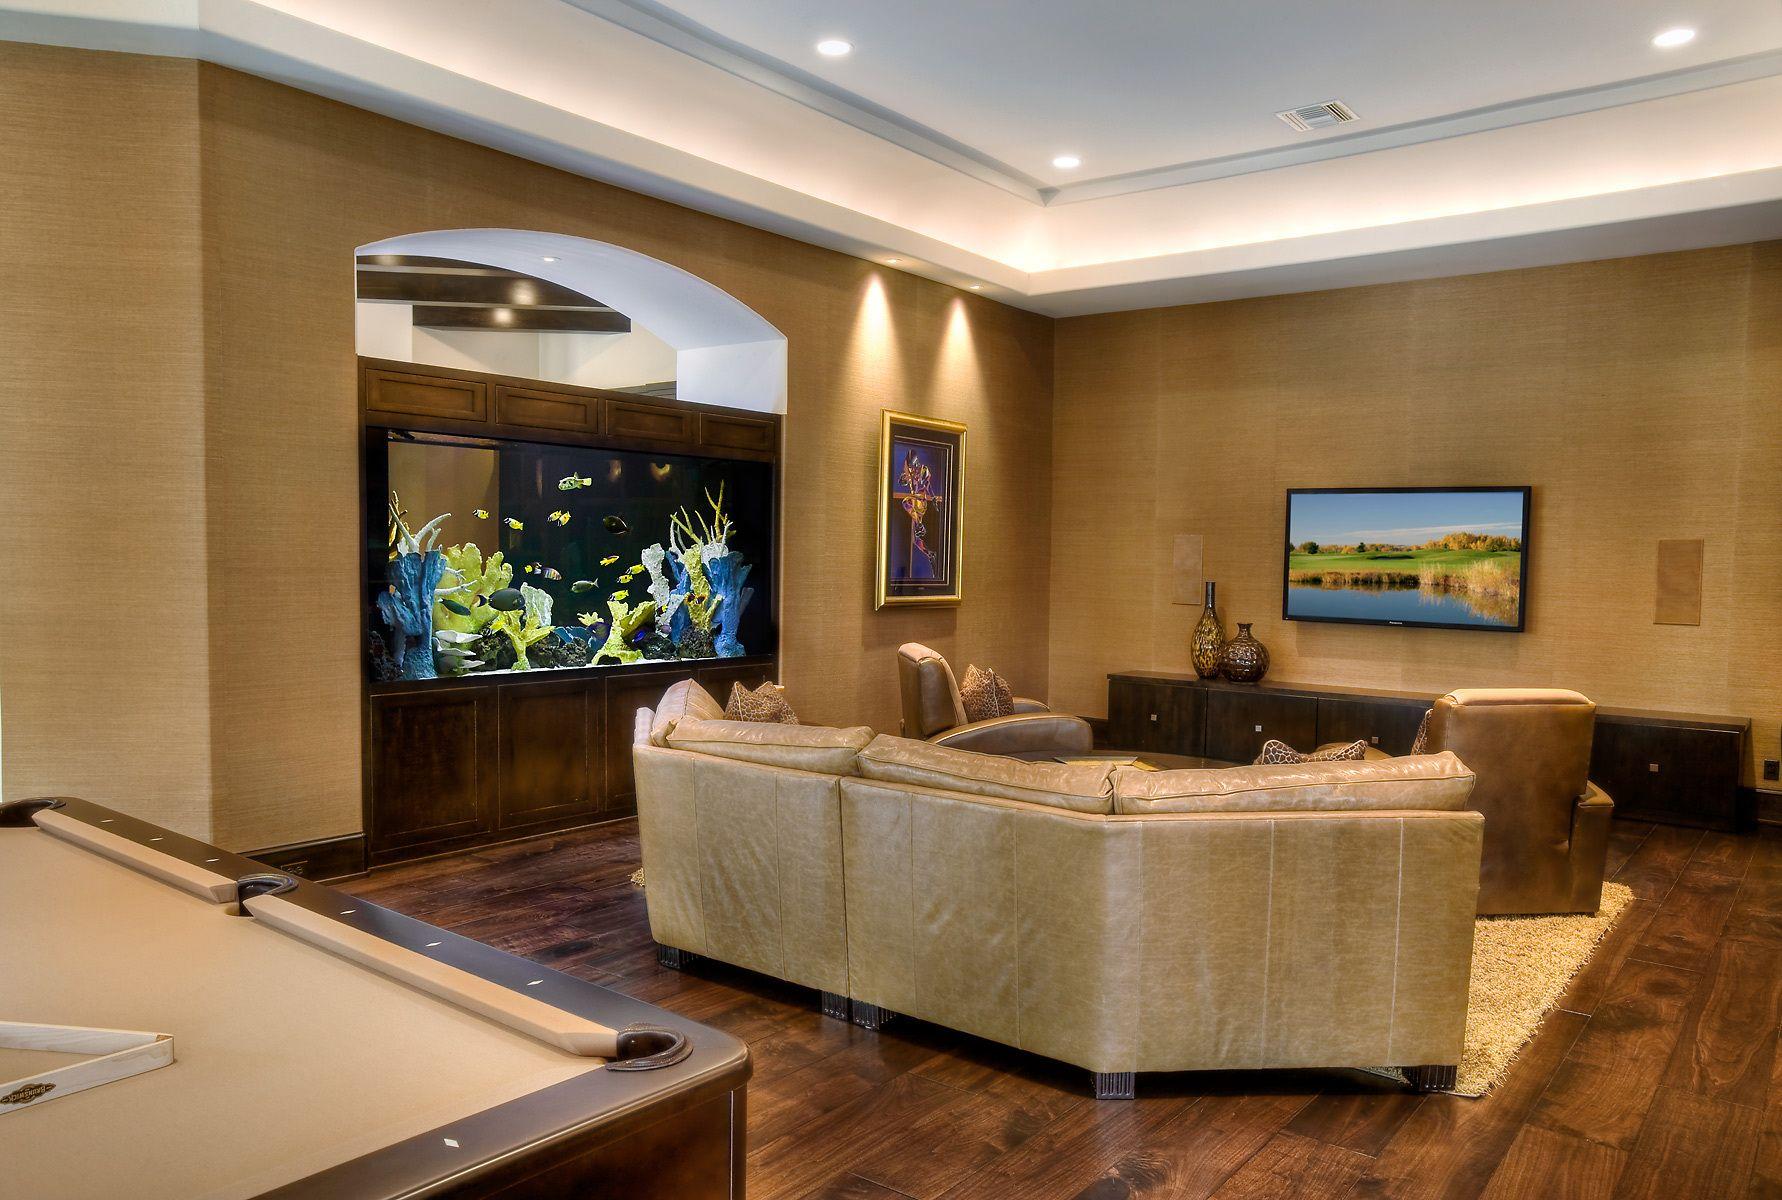 Aquarium Design Group A Decorative Saltwater Room Divider